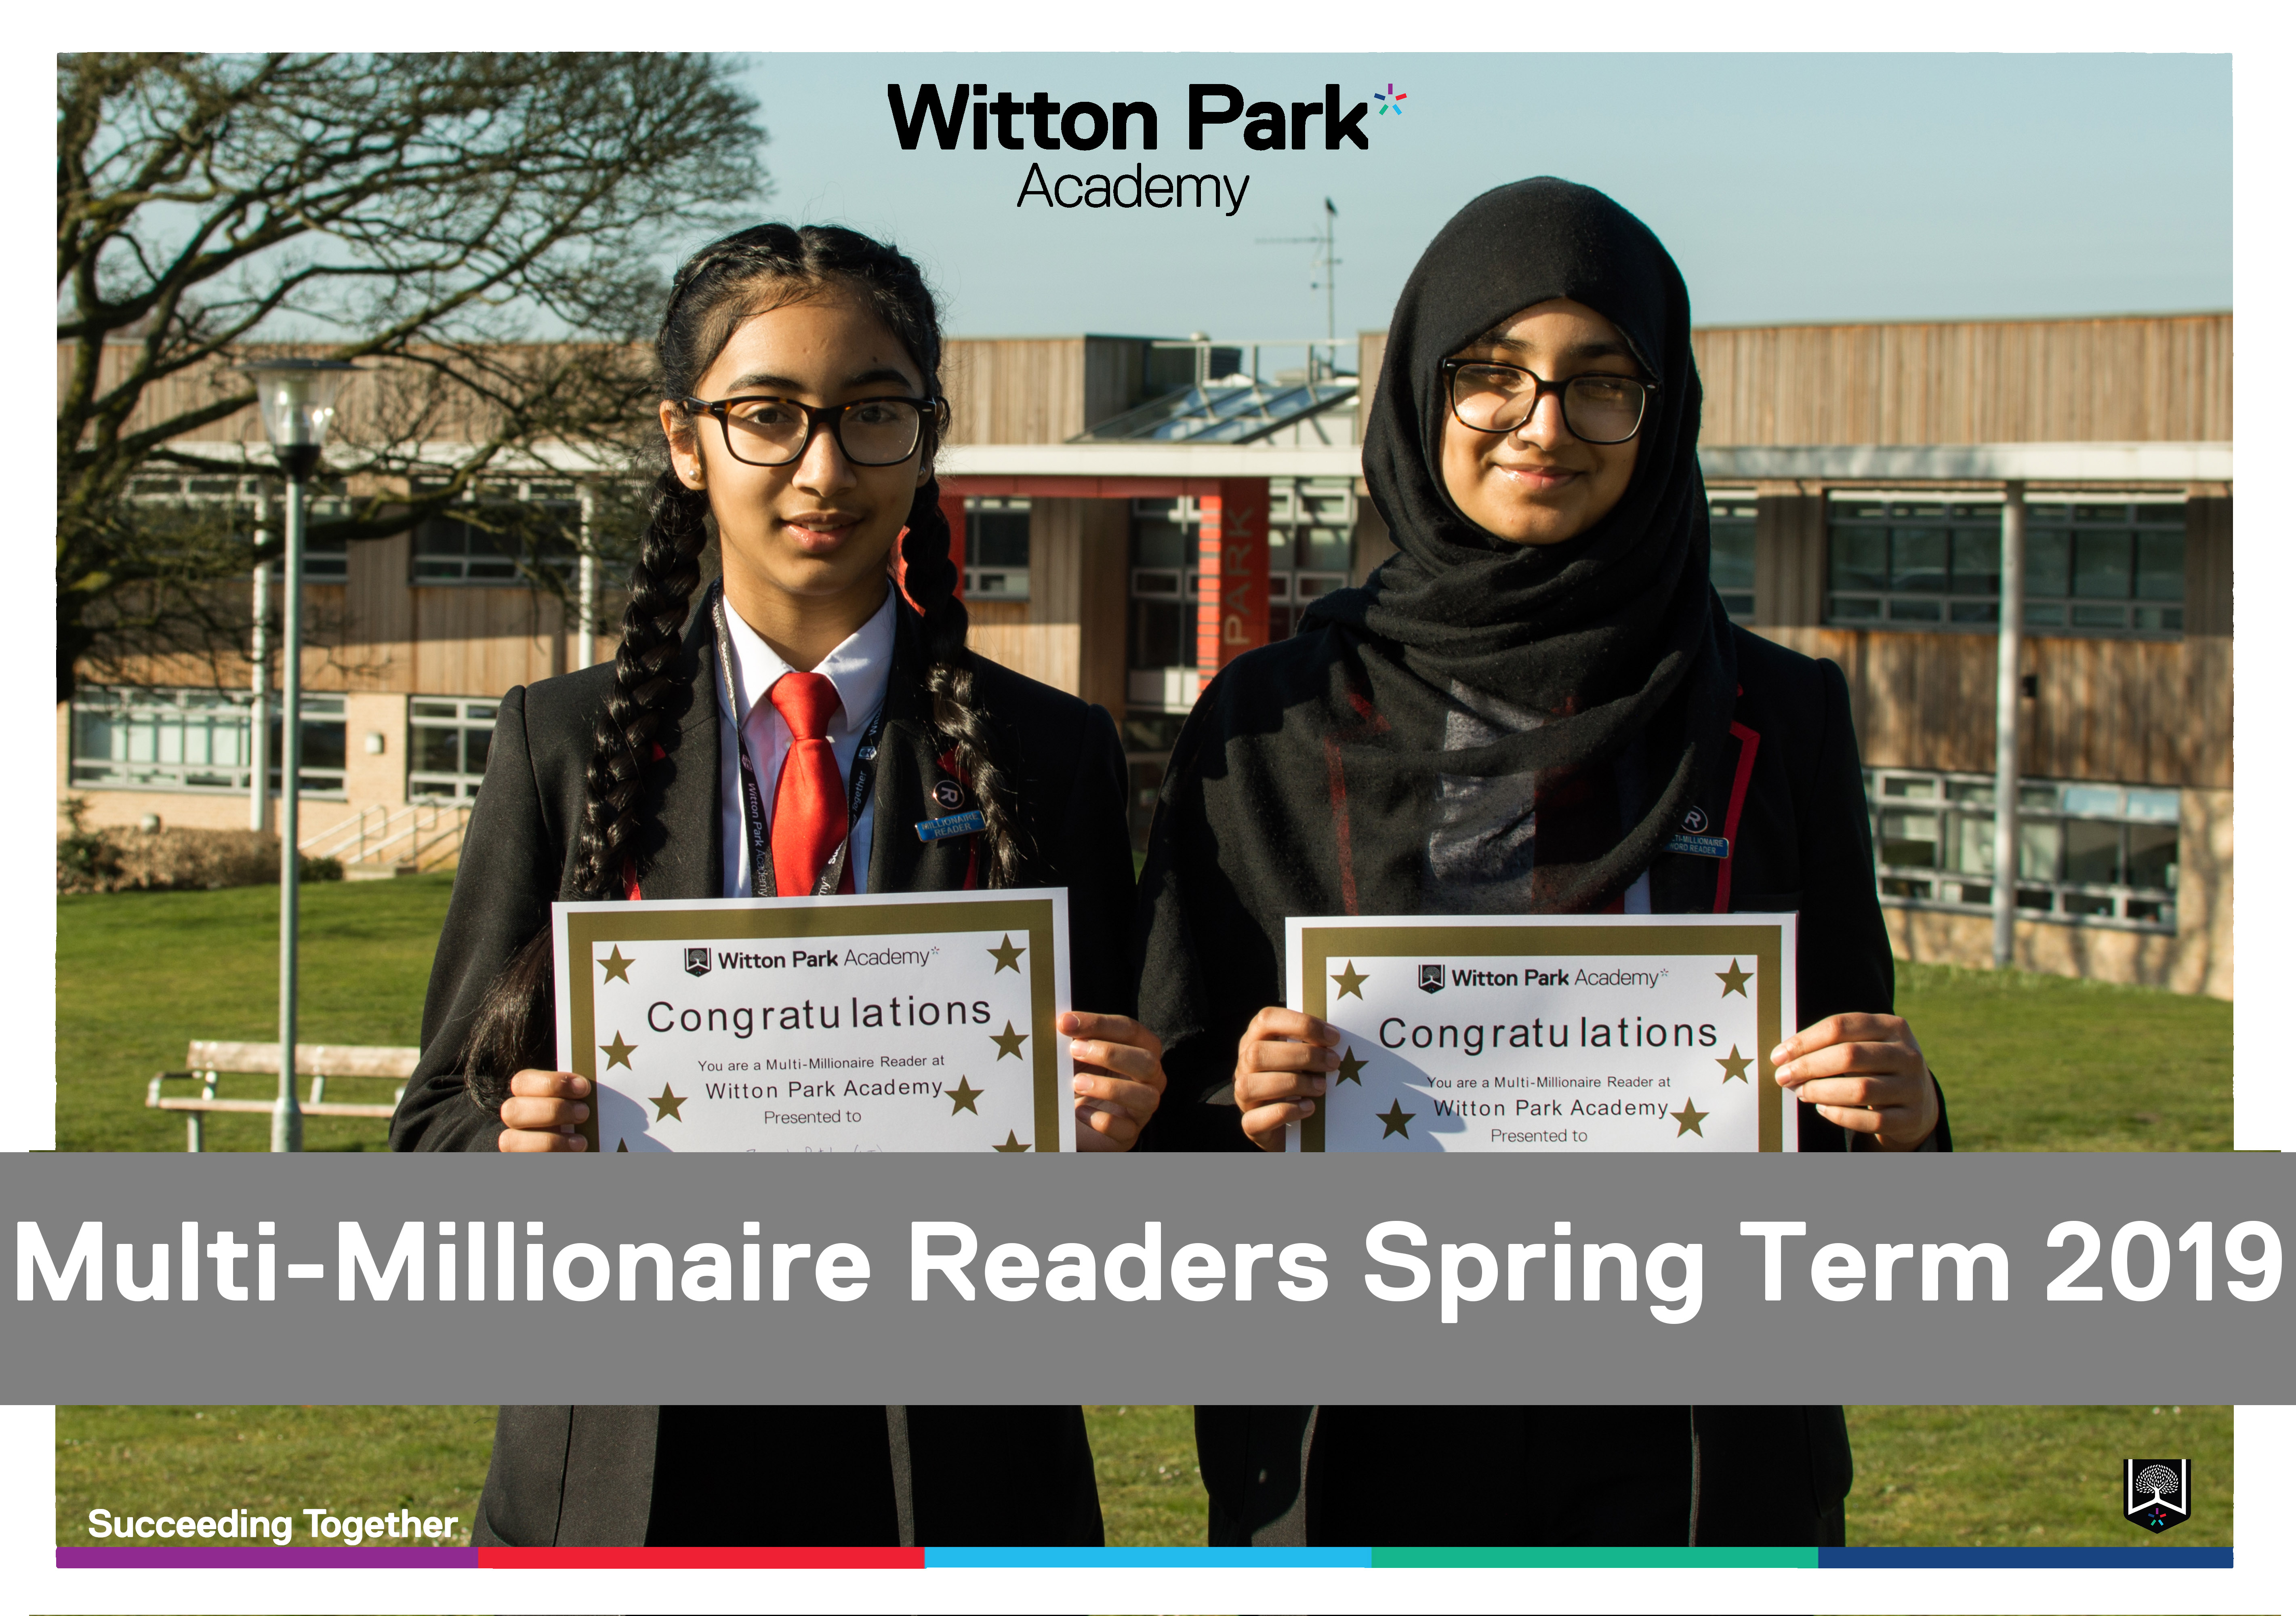 Multi-millionaire Readers Spring 2019